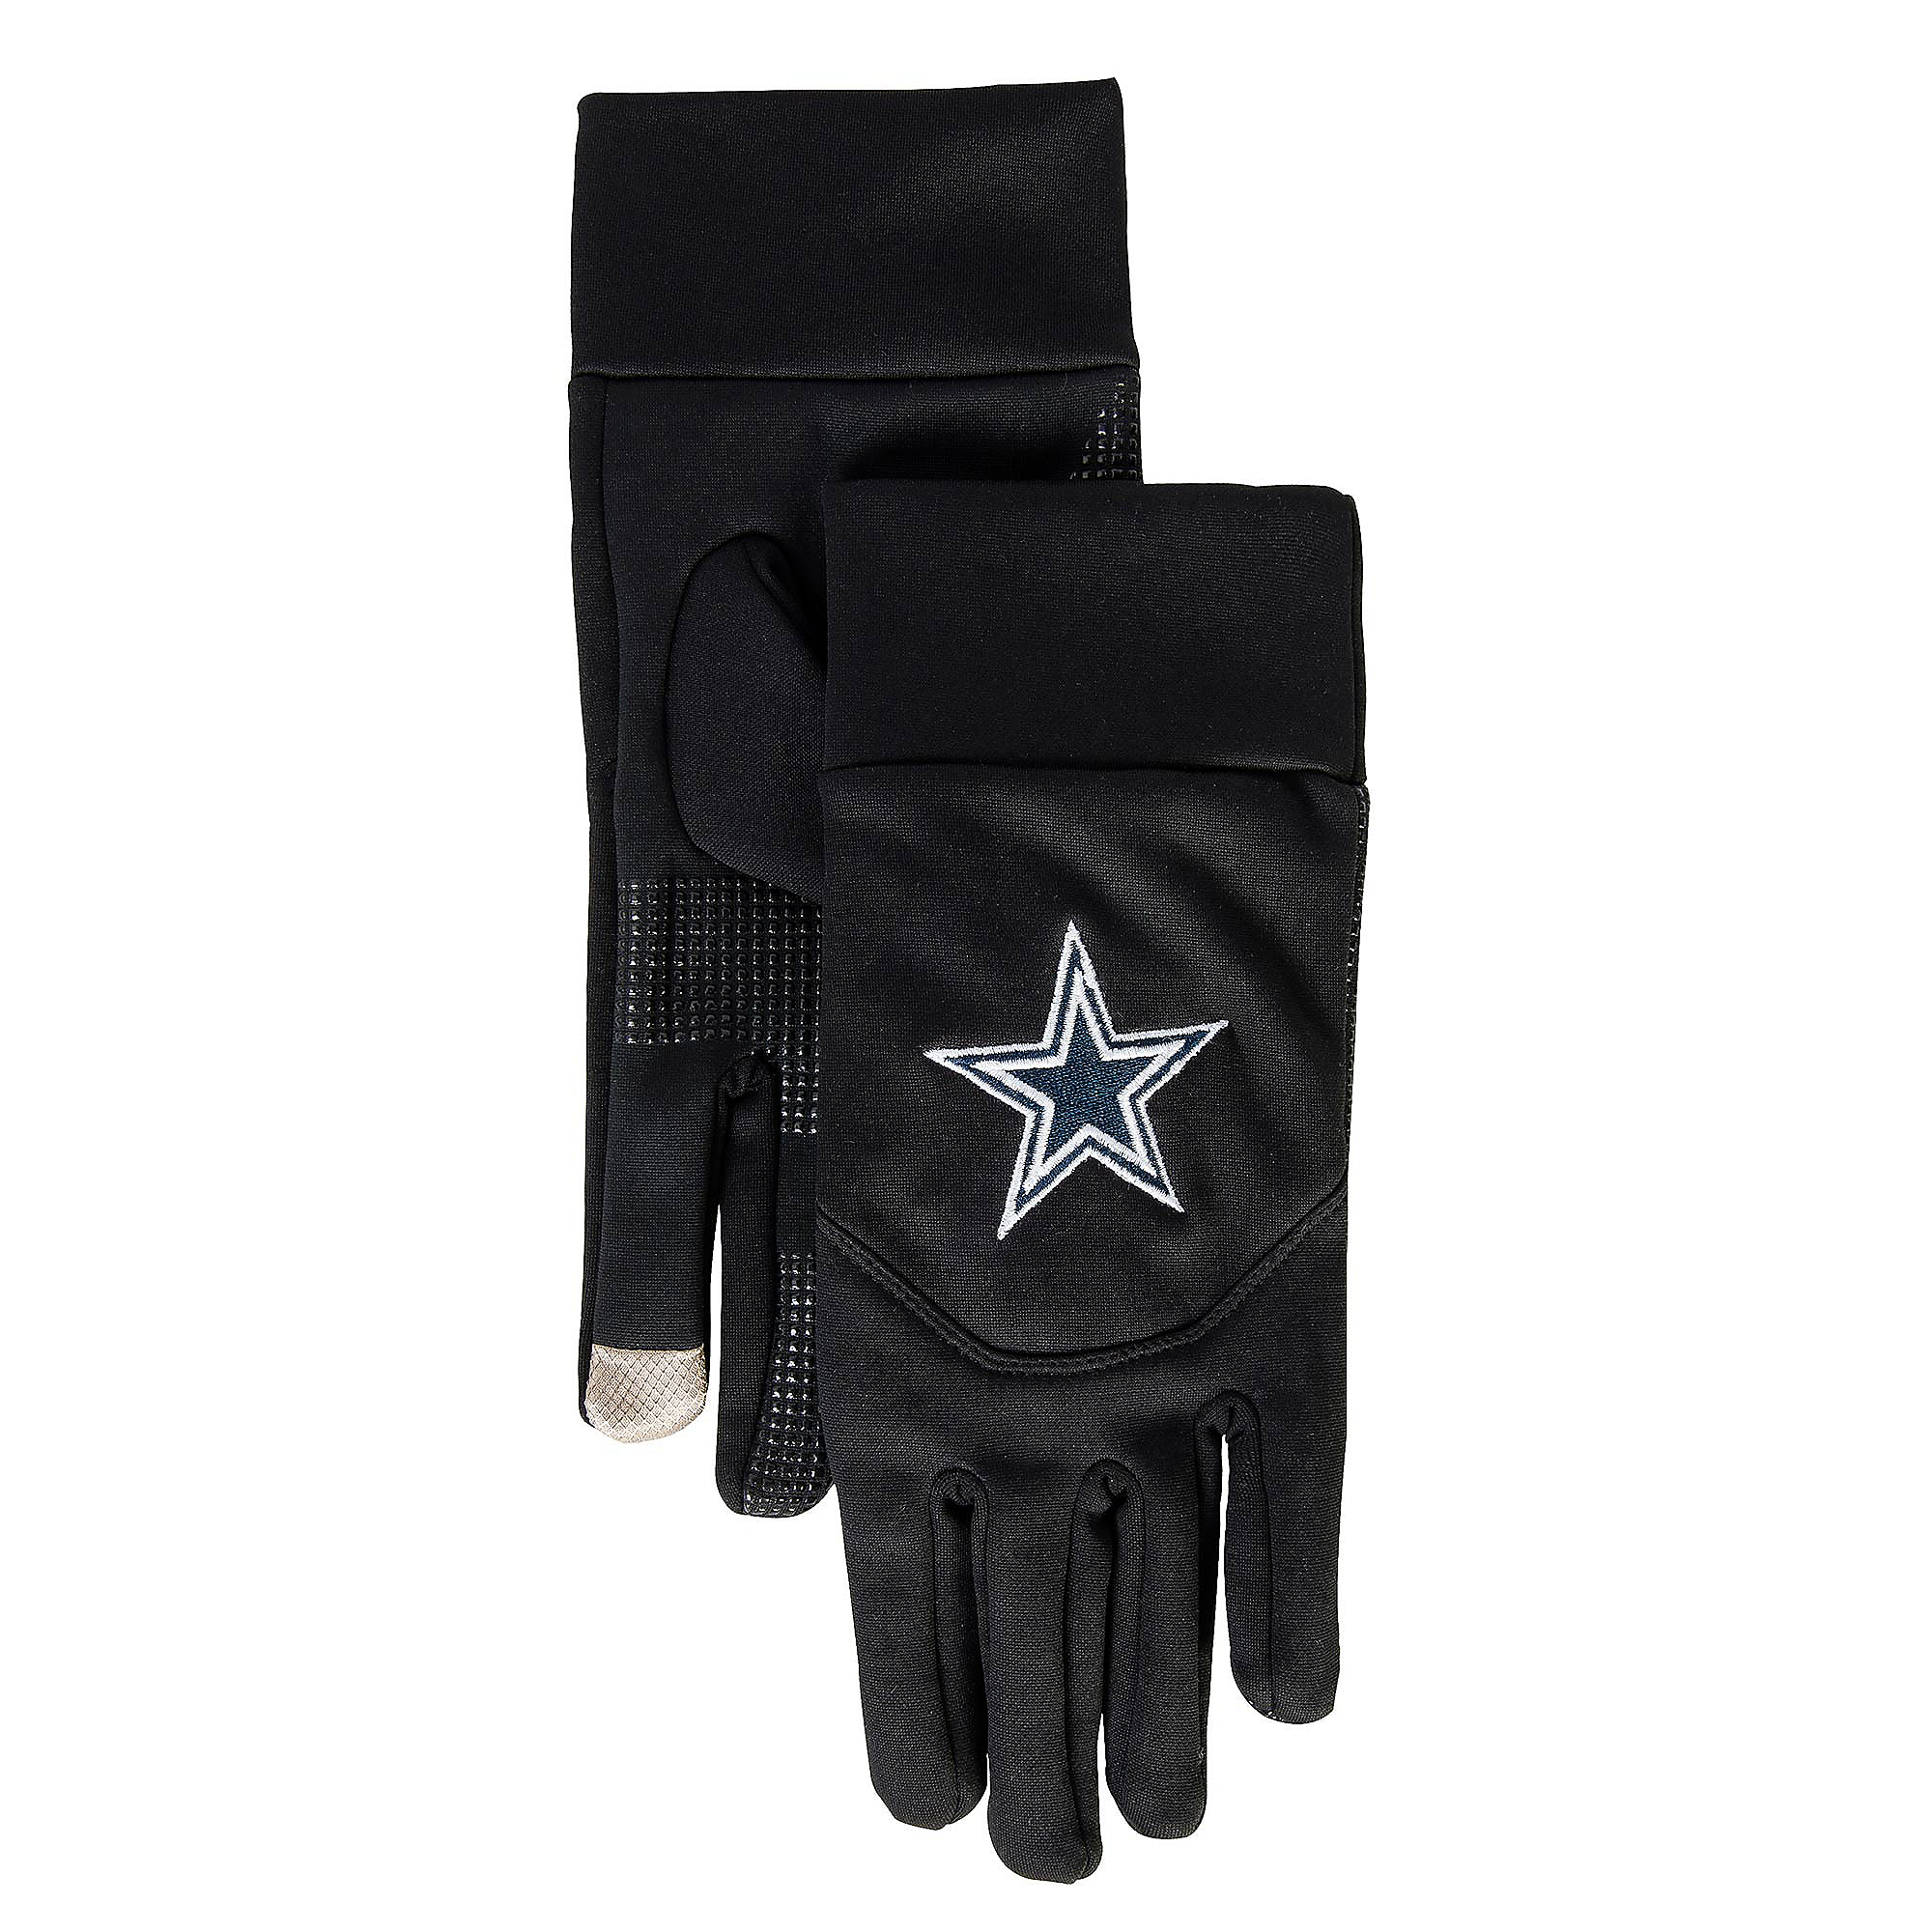 Dallas Cowboys Texting Gloves